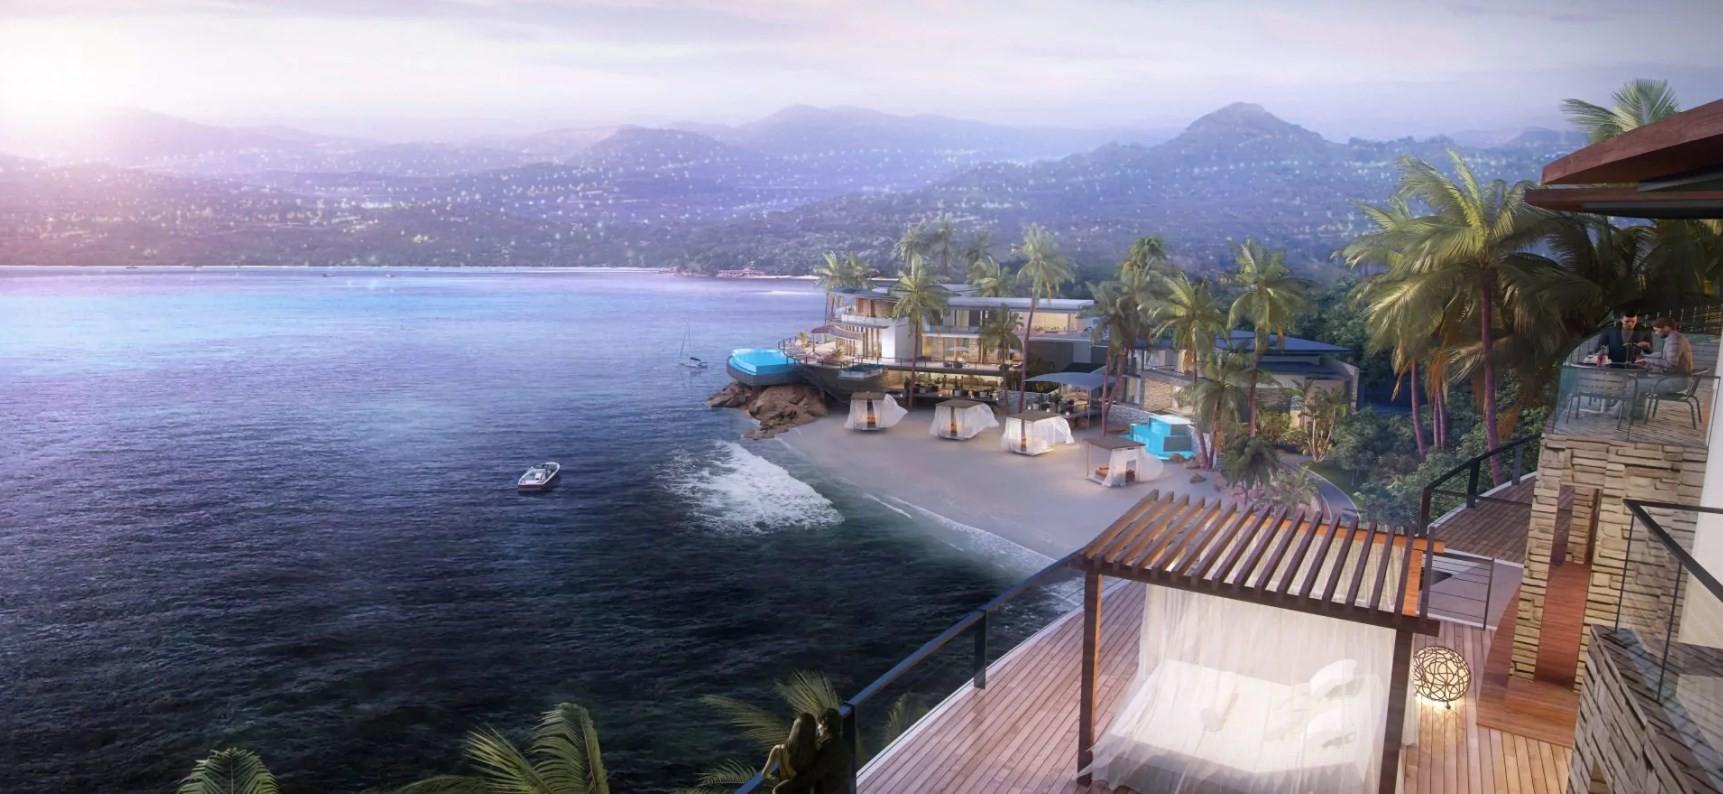 news-main-mango-house-seychelles-opens-as-part-of-lxr-hotels-resorts.1626448391.jpg